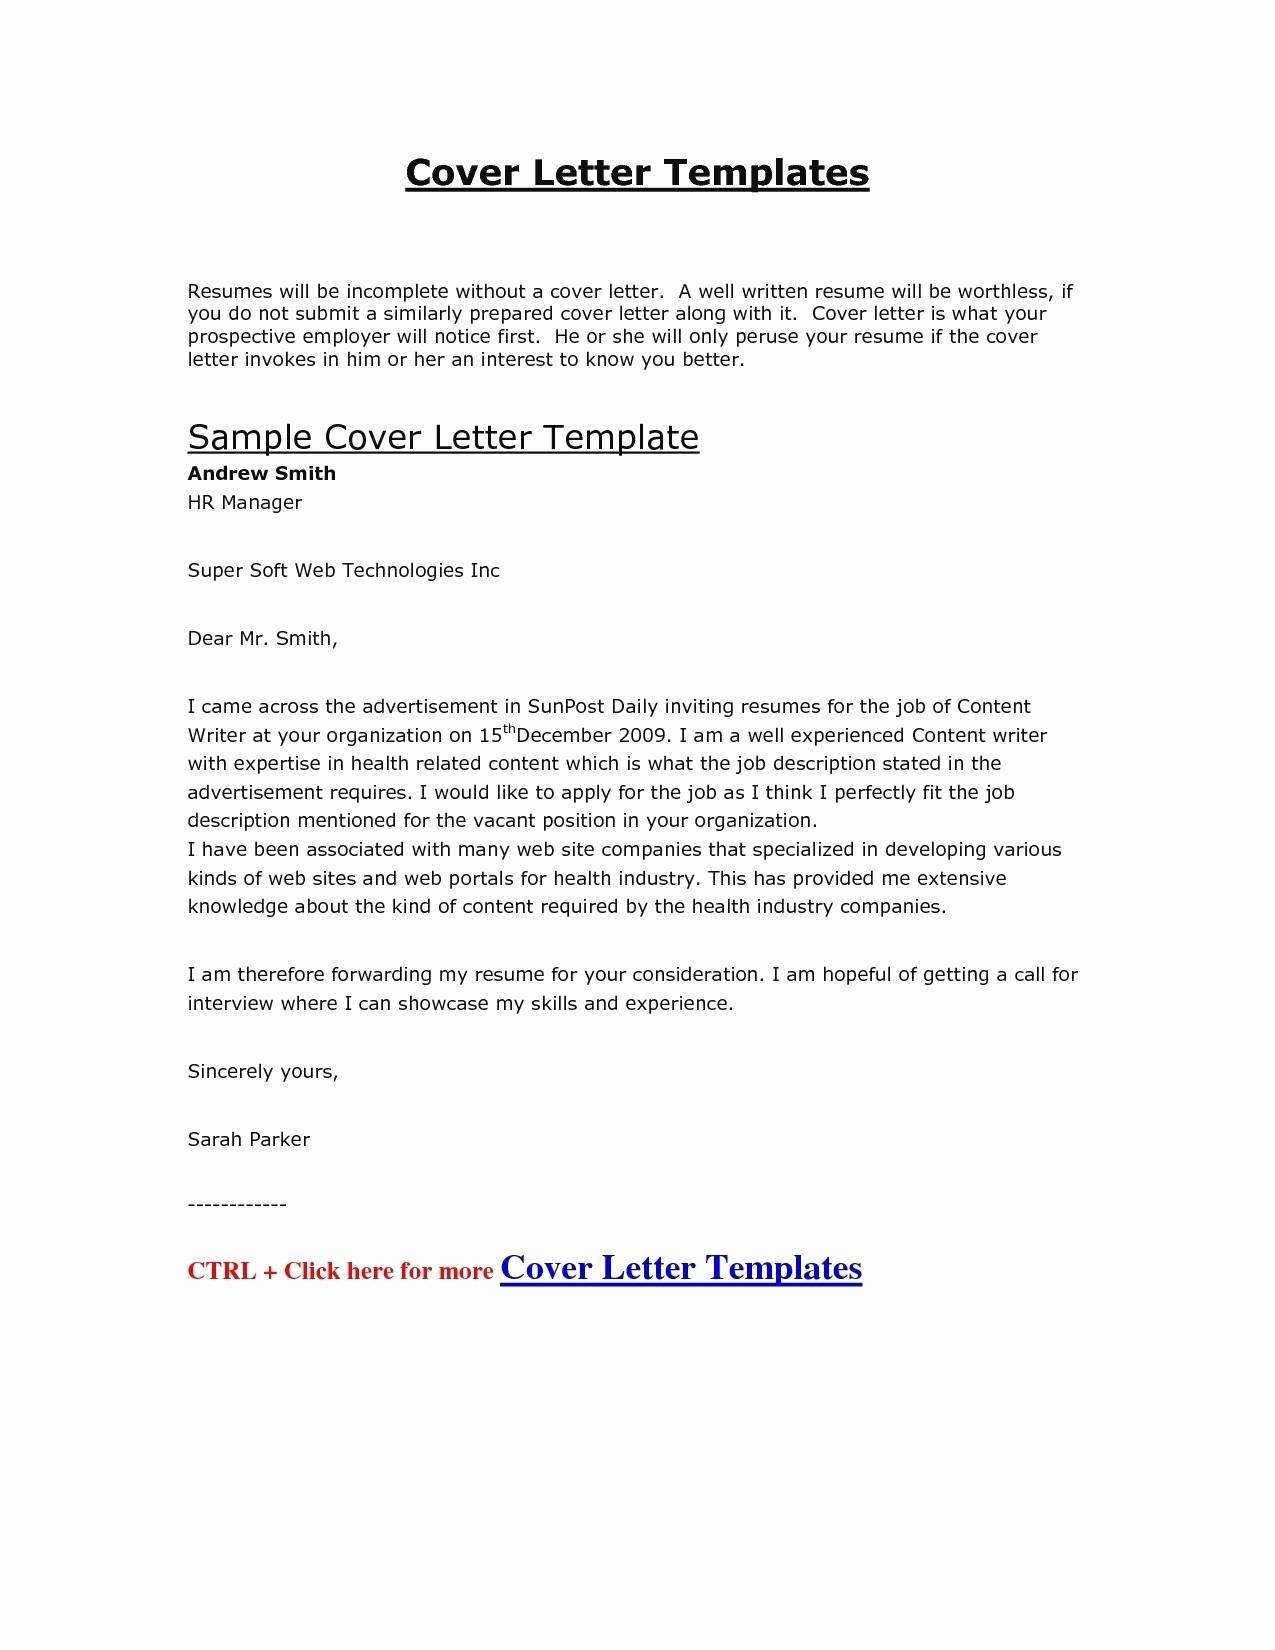 Pre Hire Letter Template - Job Application Letter format Template Copy Cover Letter Template Hr